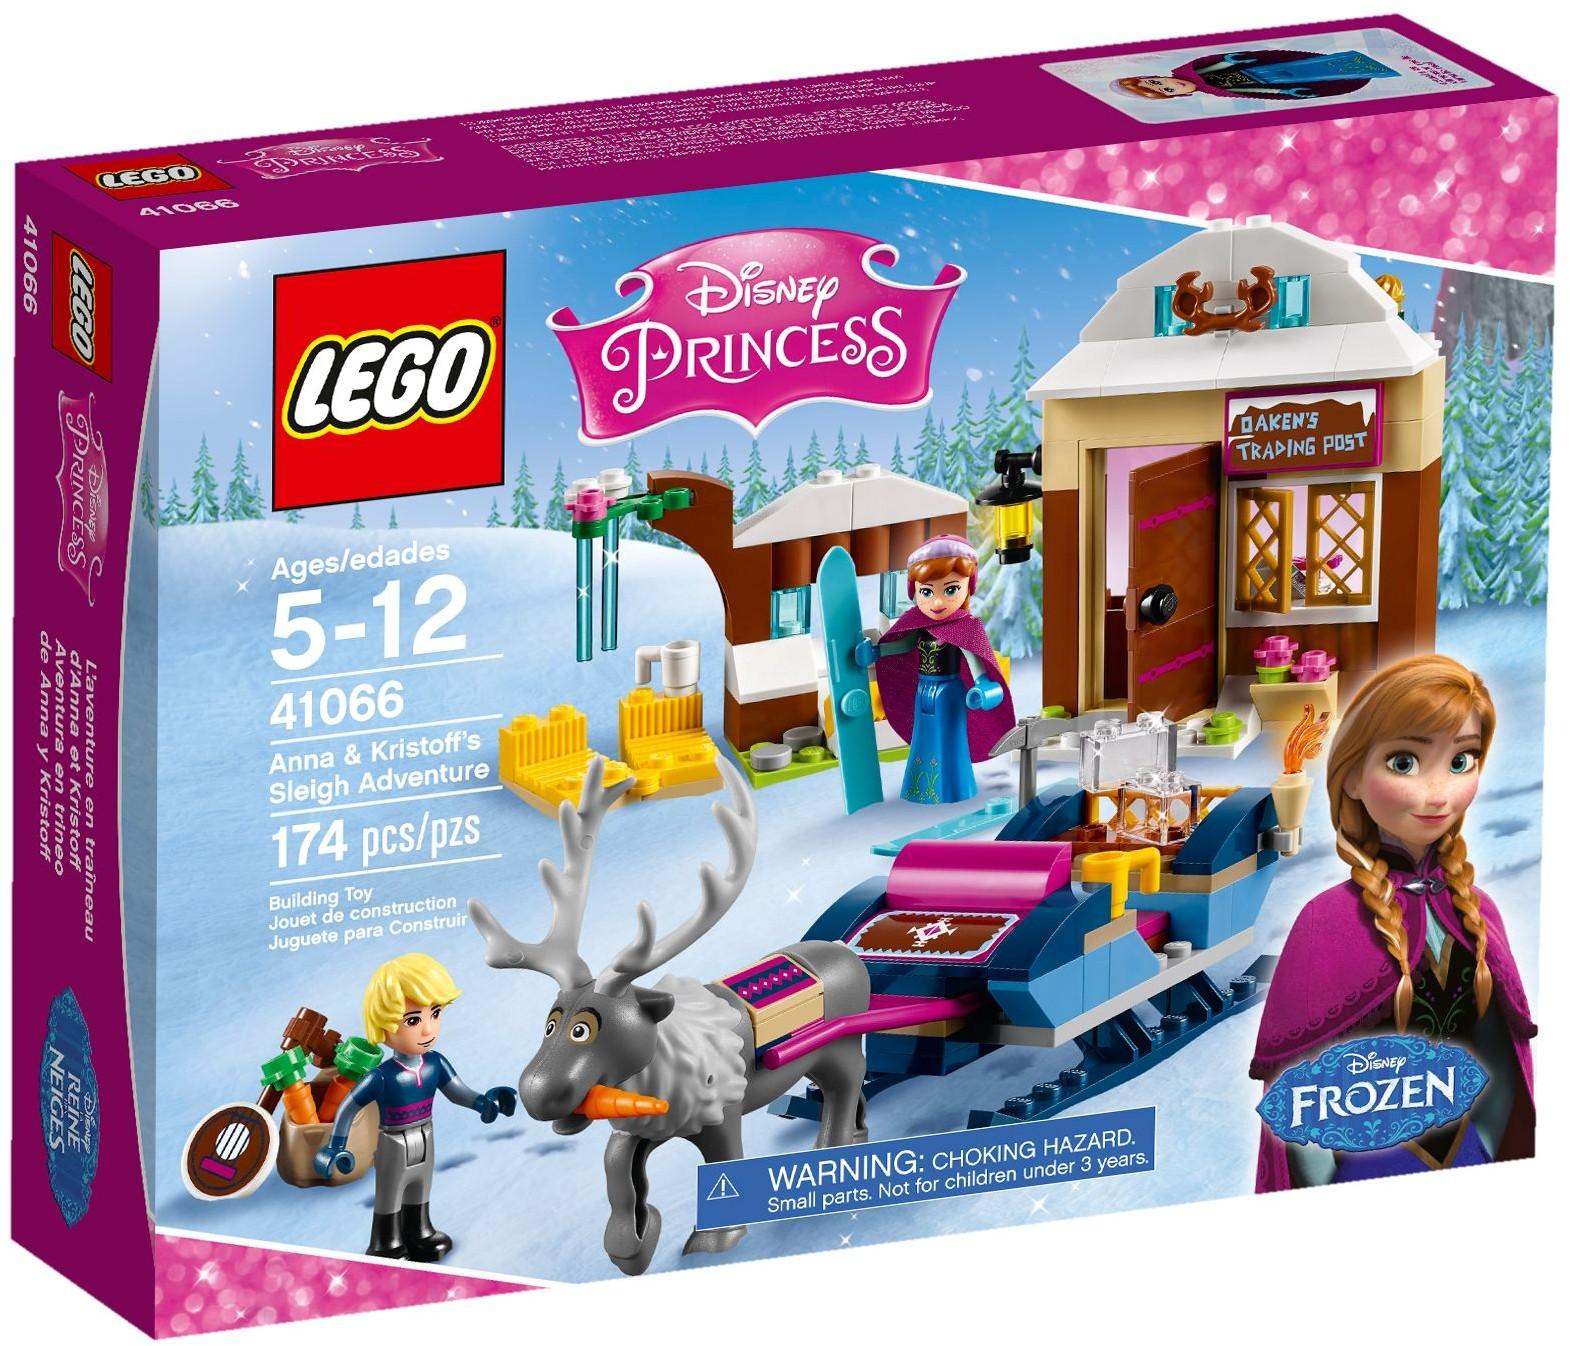 LEGO Disney Princess 41066 Anna & Kristoff's Sleigh